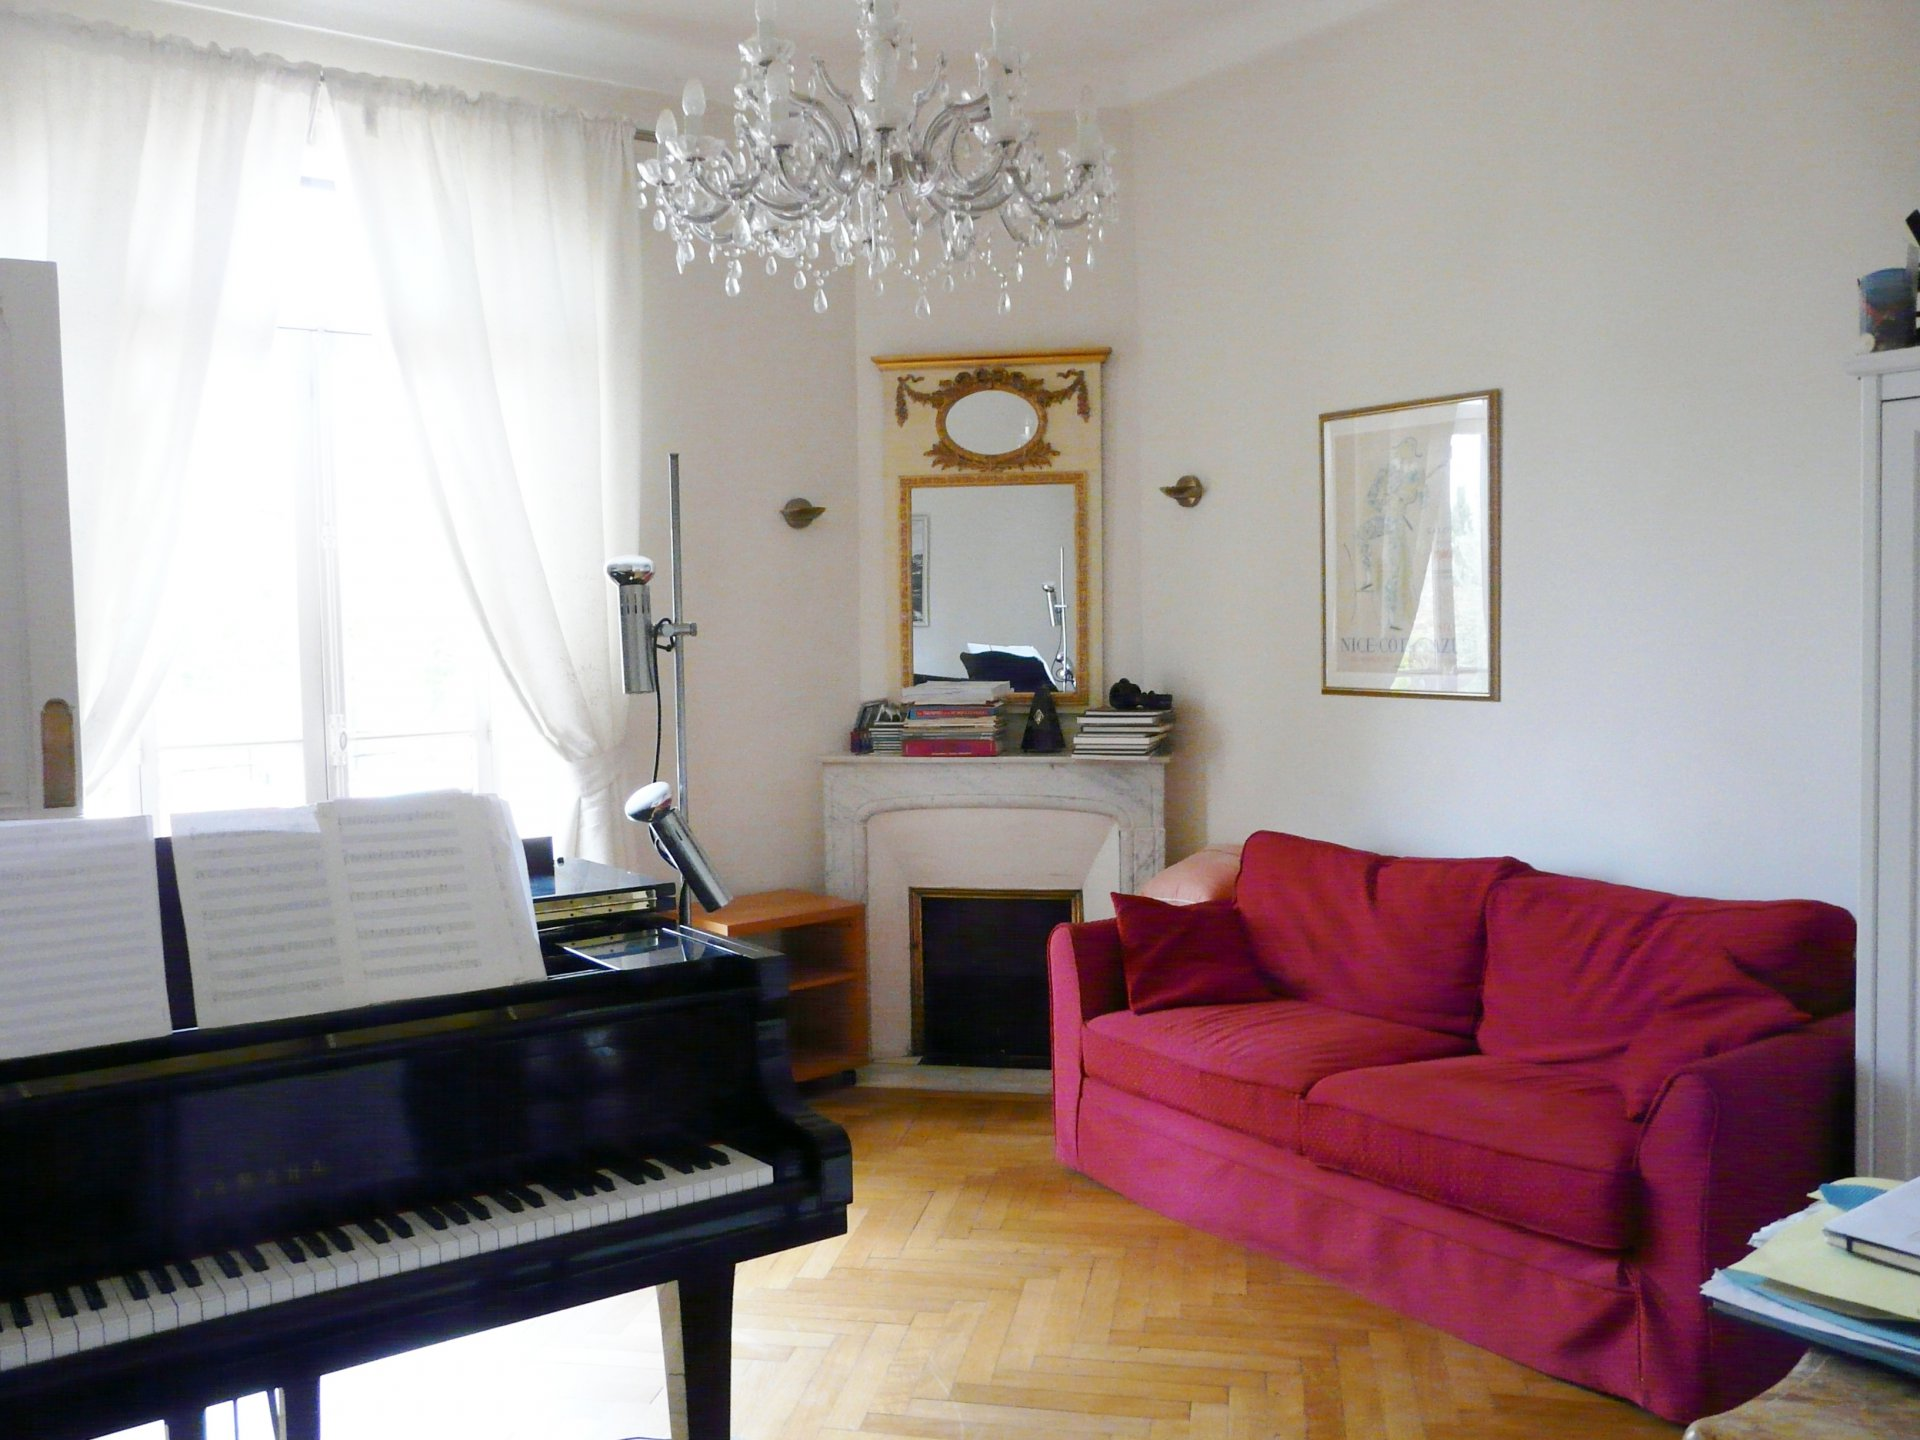 Living-room, chandelier, natural light, fireplace, wood floor